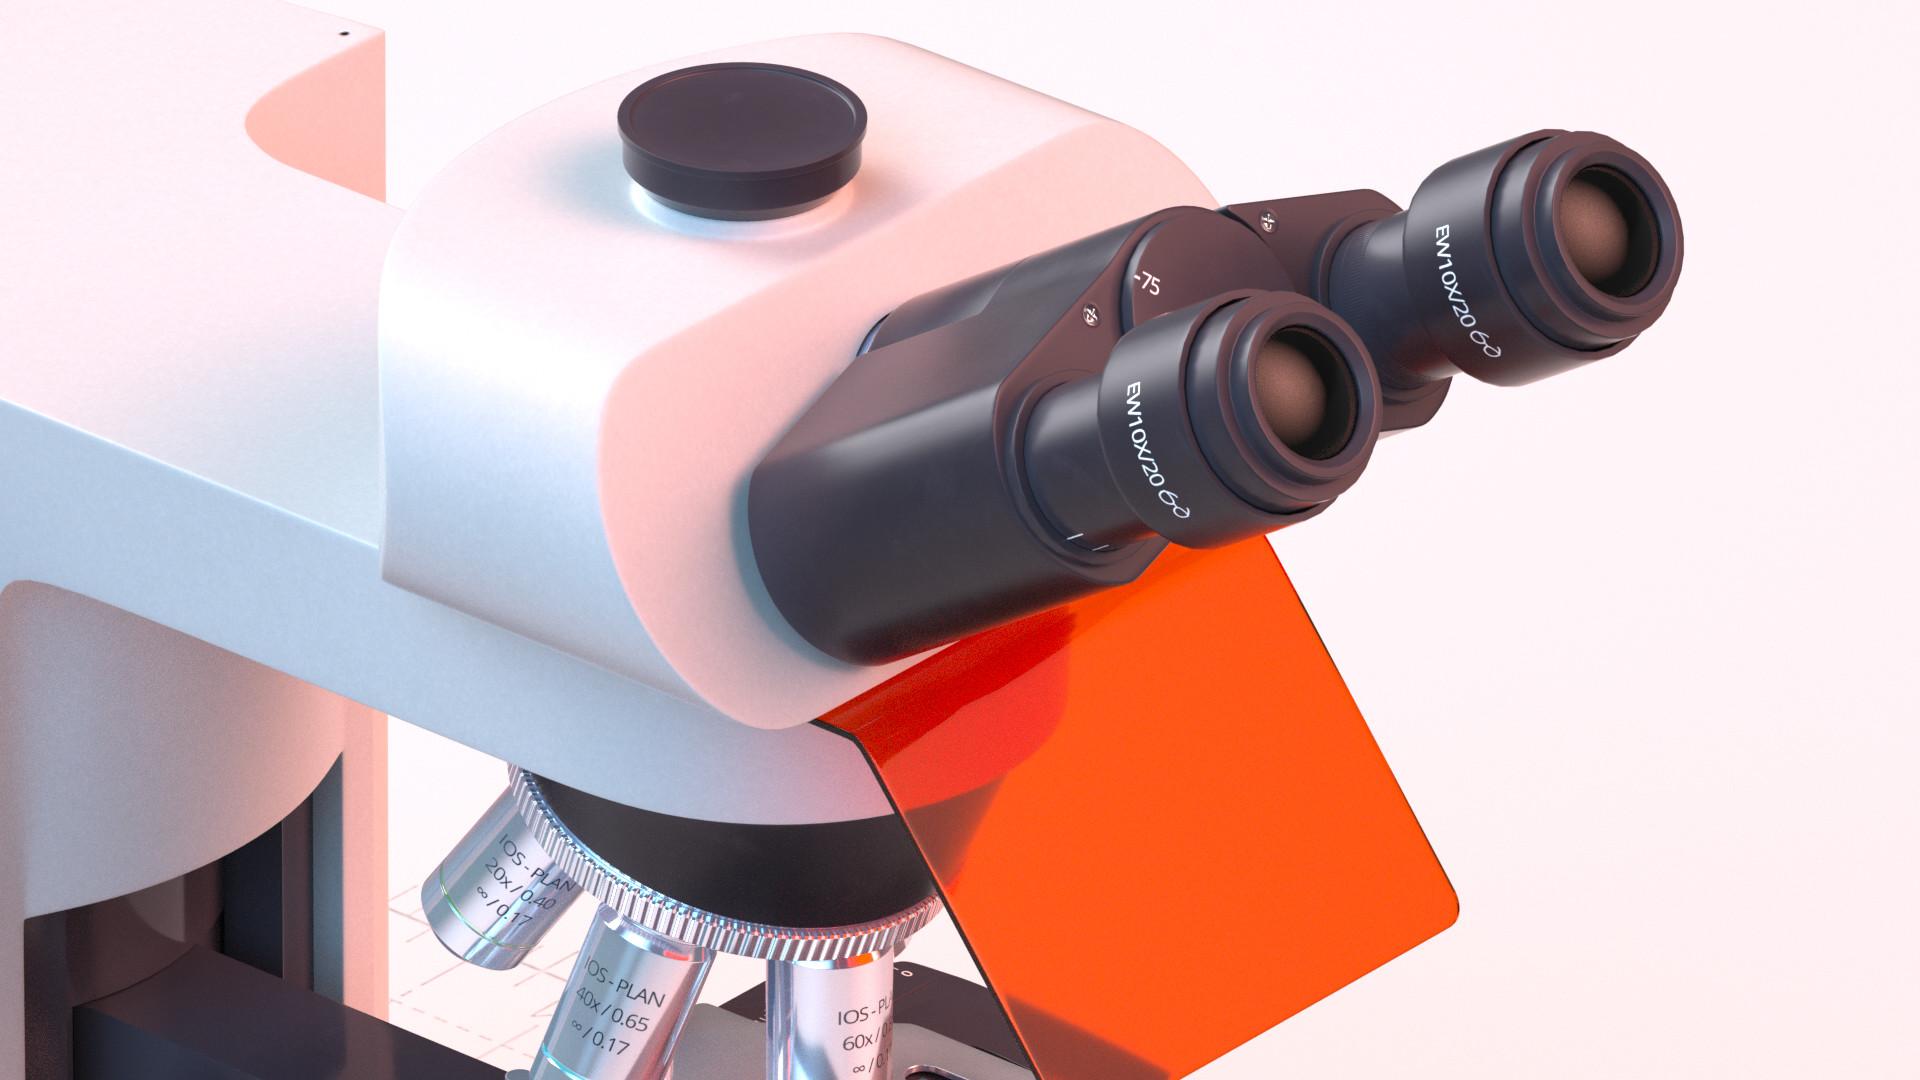 Basile arquis magicbulb upright microscope 03